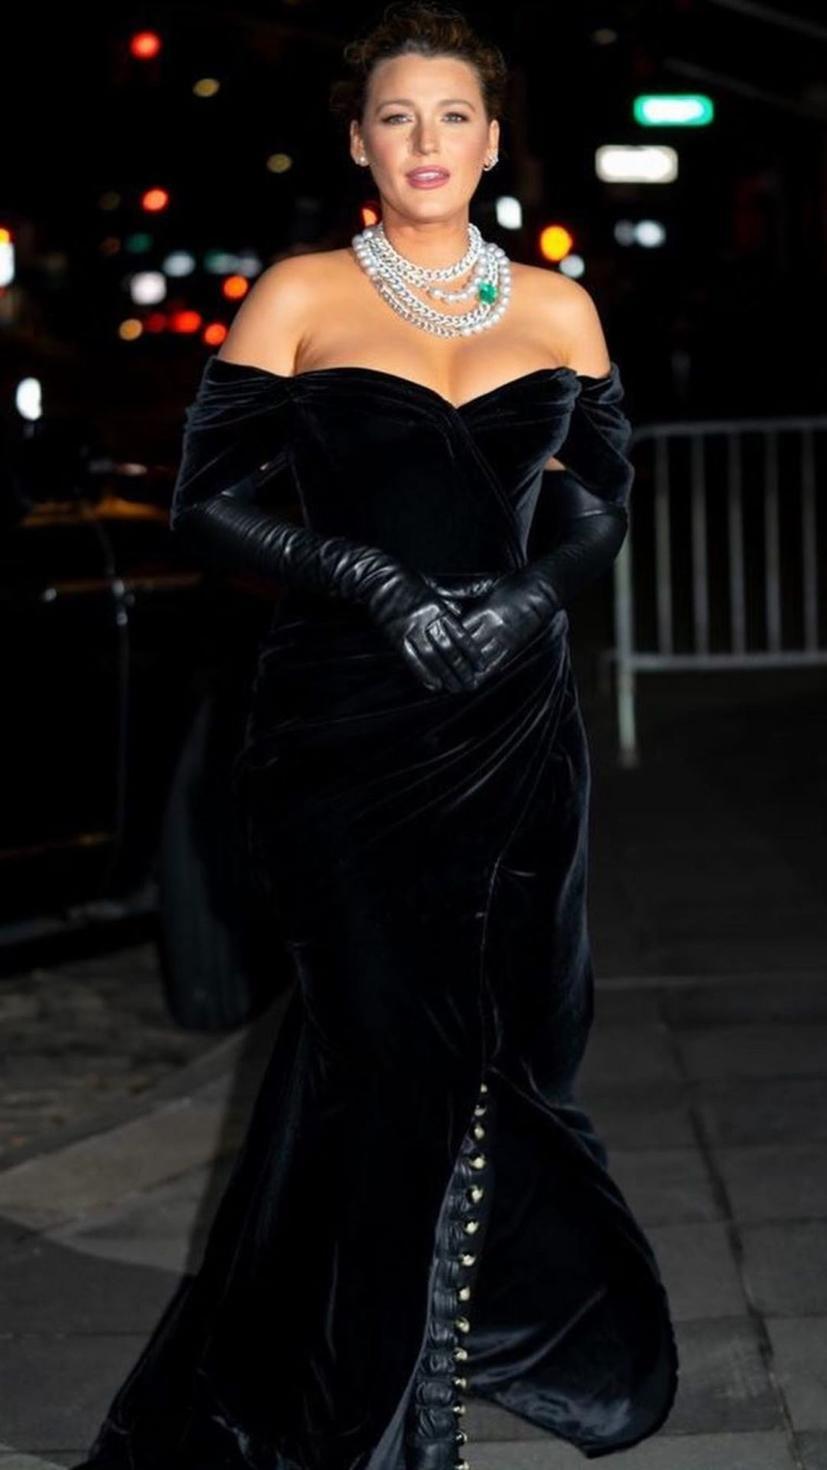 Blake Lively wears a black velvet off-the-shoulder gown by Dolce & Gabbana with Lorraine Schwartz jewellery